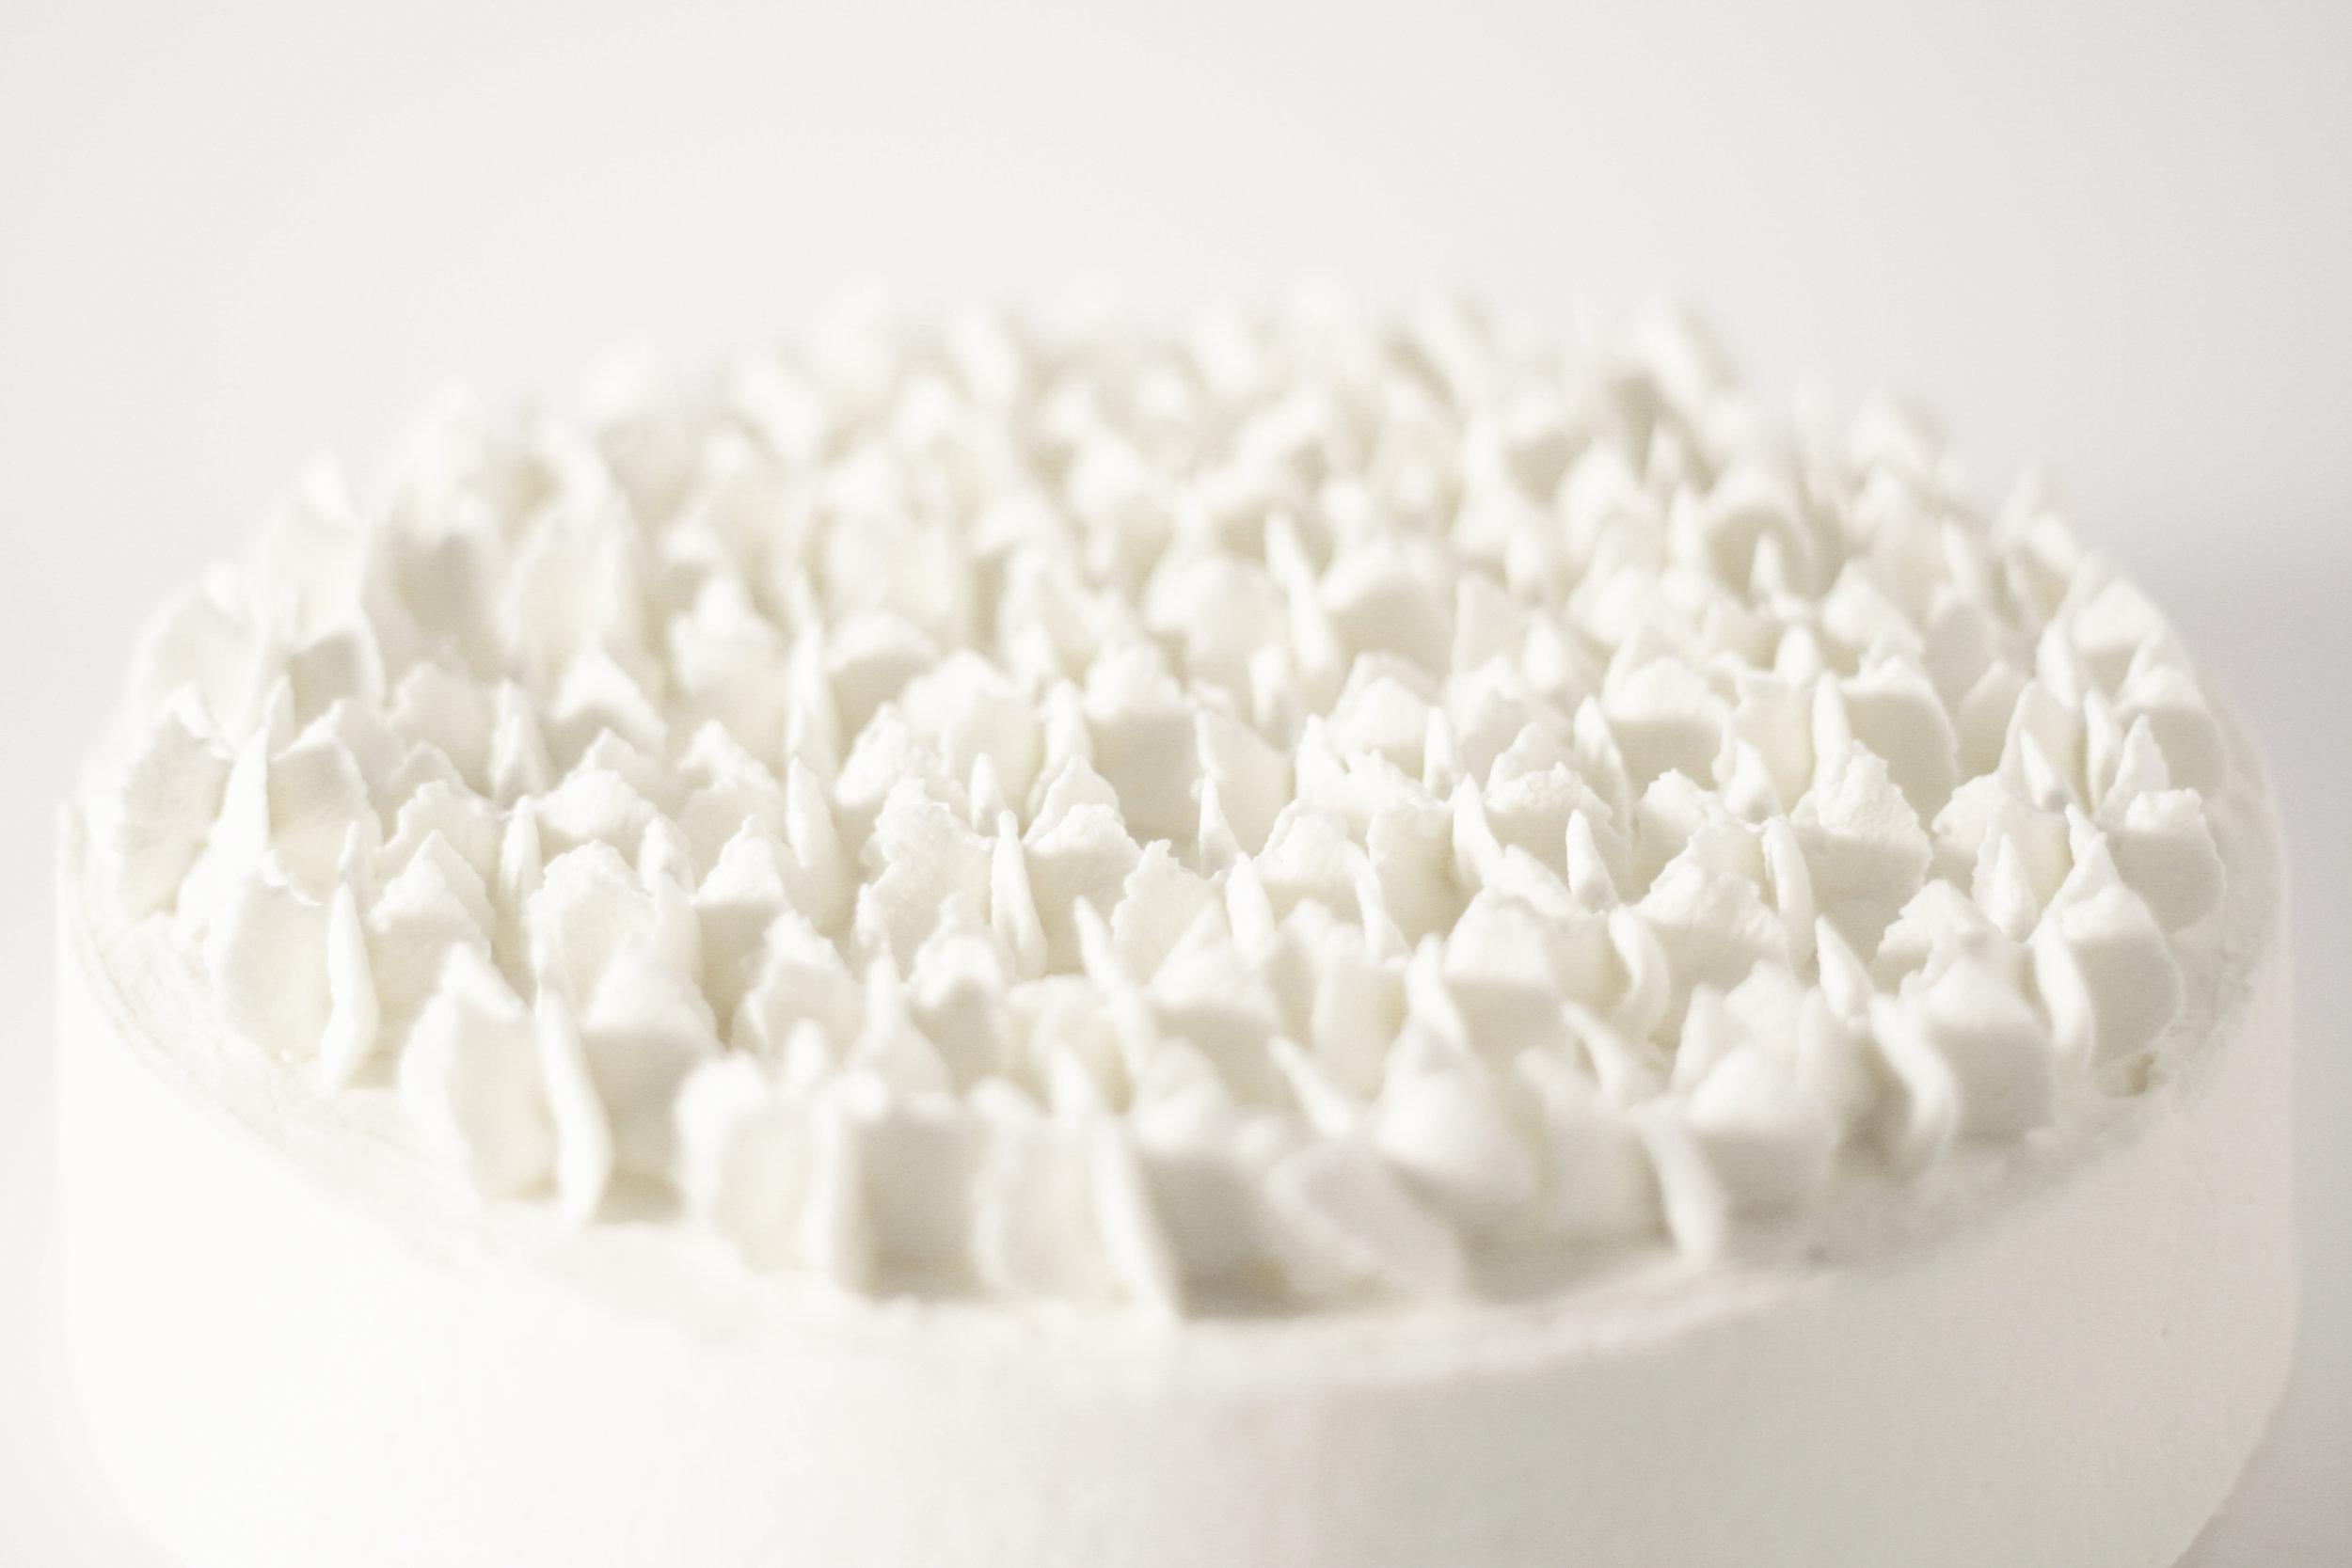 CAKE_young_coconut_cream05b_fade.JPG